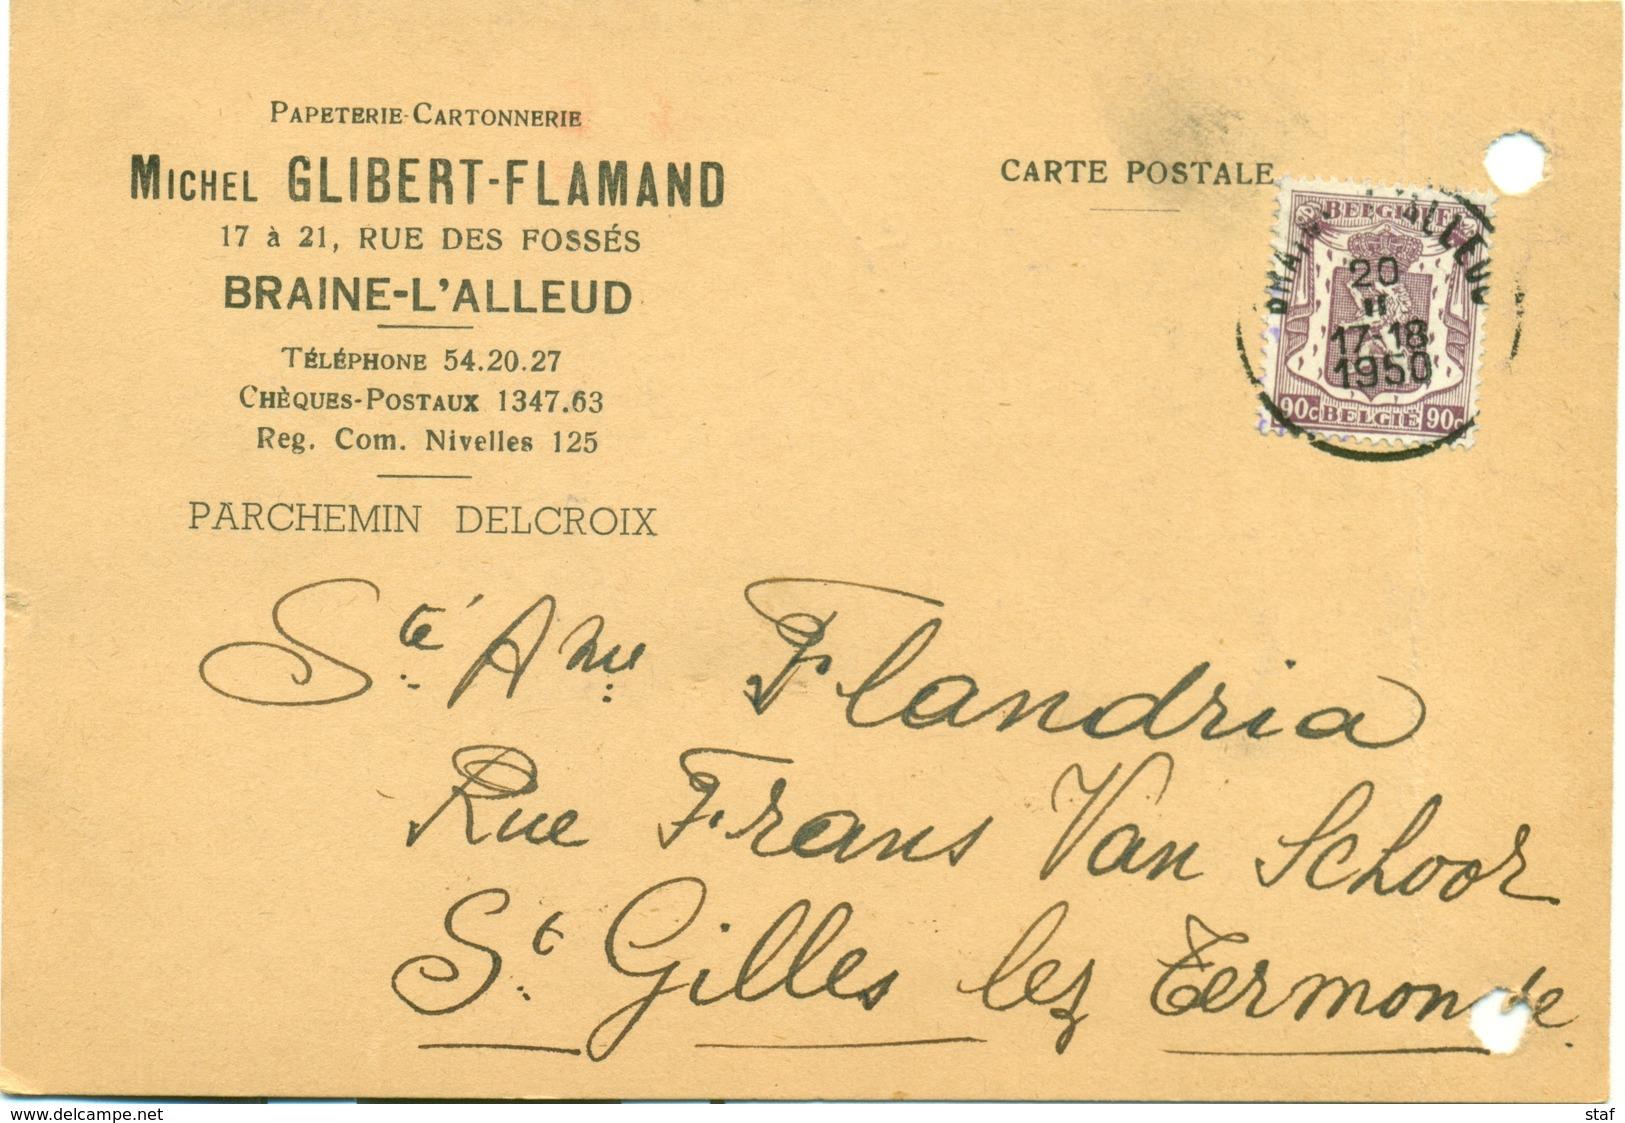 Papeterie Cartonnerie Michel Glibert - Flamand à Braine-l'-Alleud - 1950 - Printing & Stationeries